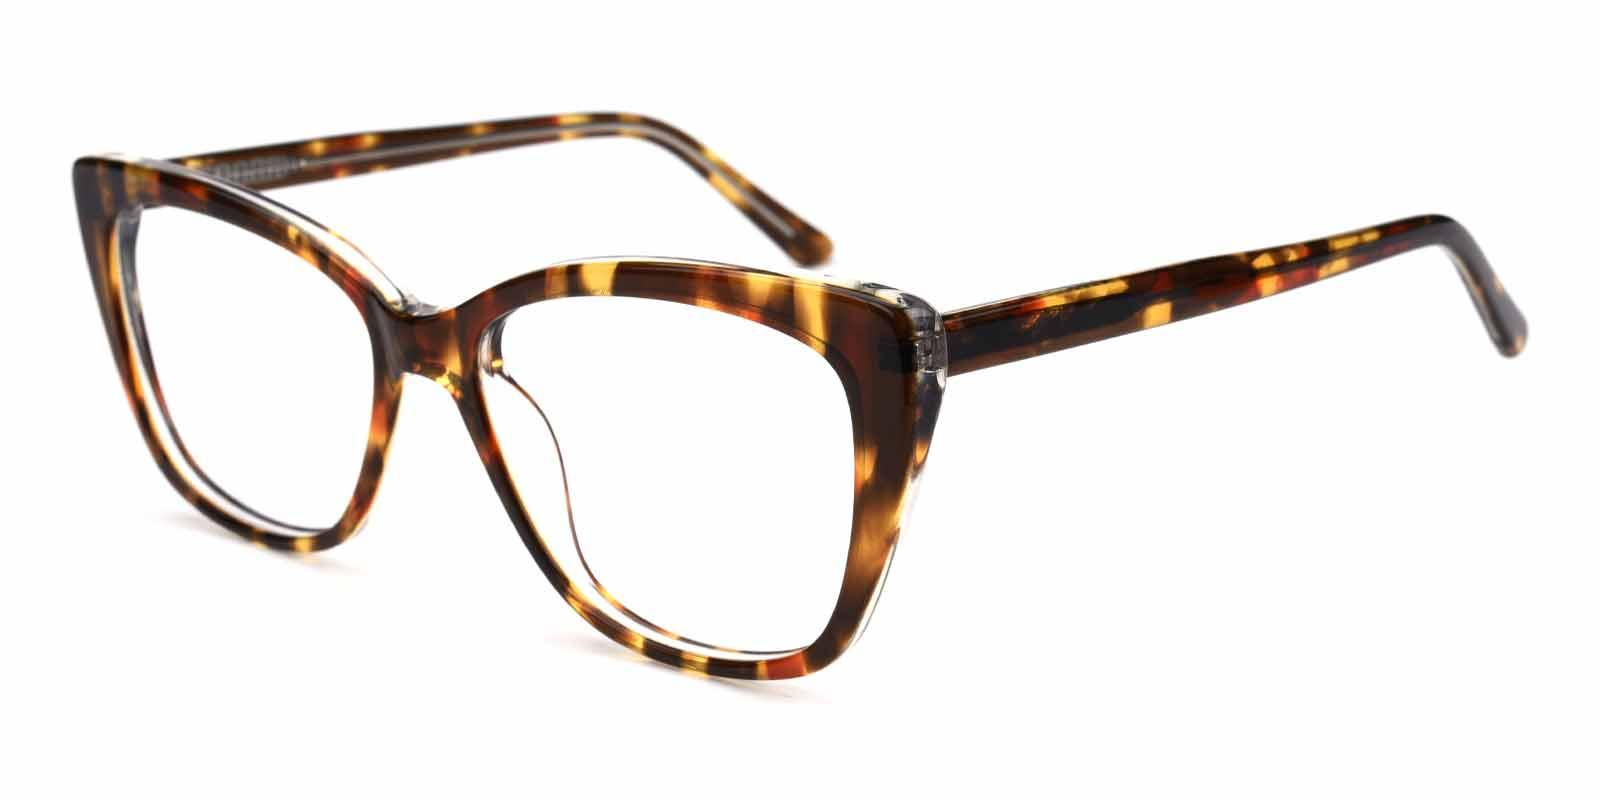 Kiko-Tortoise-Cat-Acetate-Eyeglasses-additional1